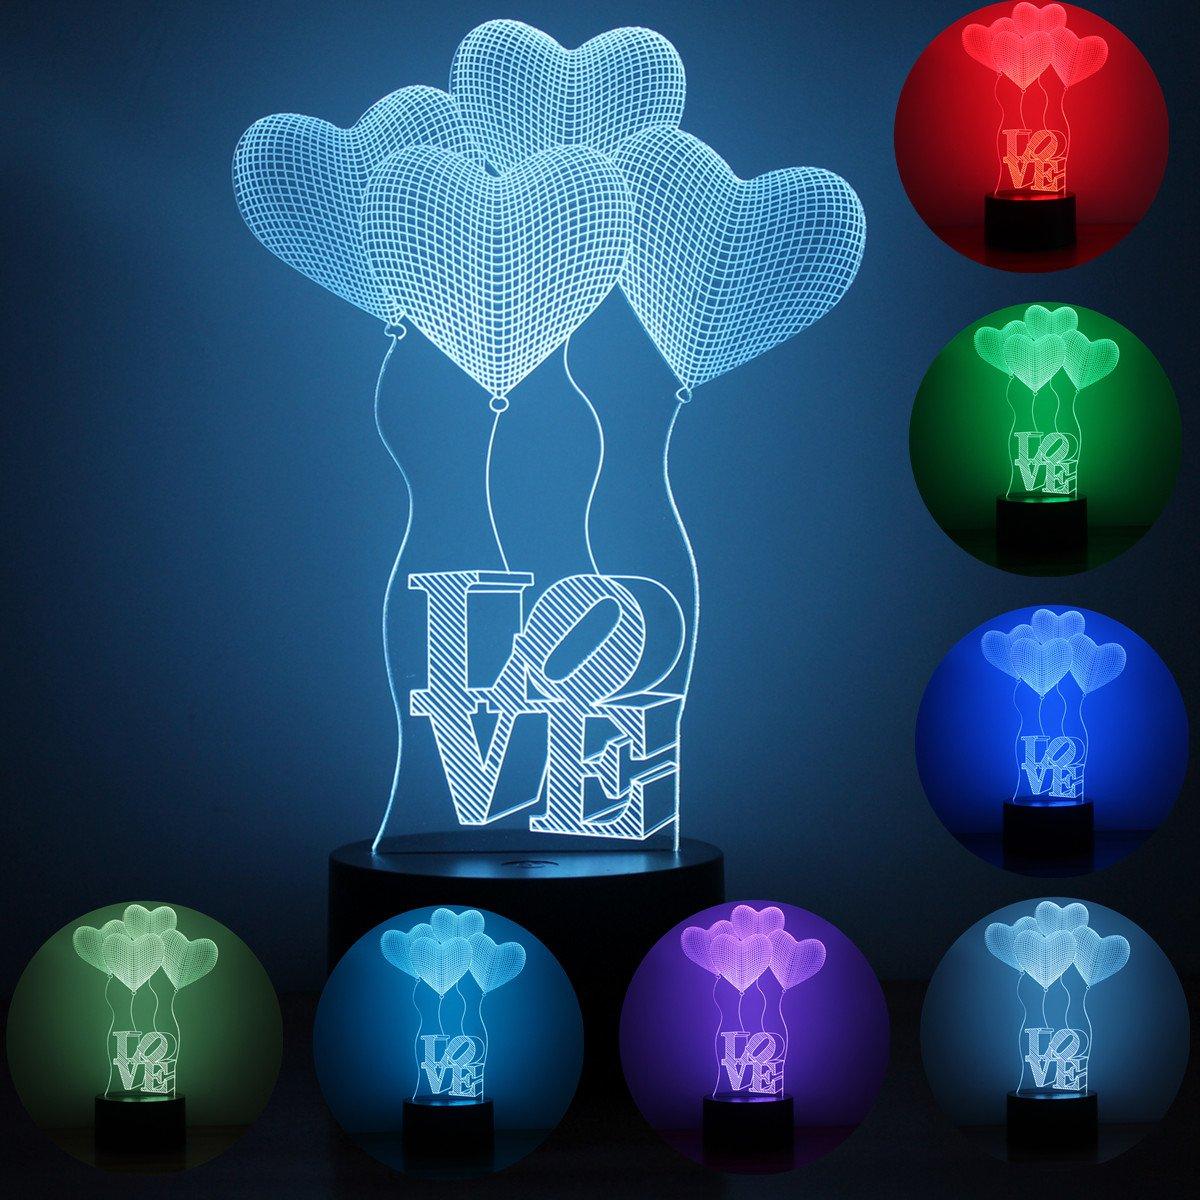 Love balloon Pattern 3D Illusion Platform Night Lighting Touch Botton 7 Color Change Decor LED Lamp For Christmas Children gift